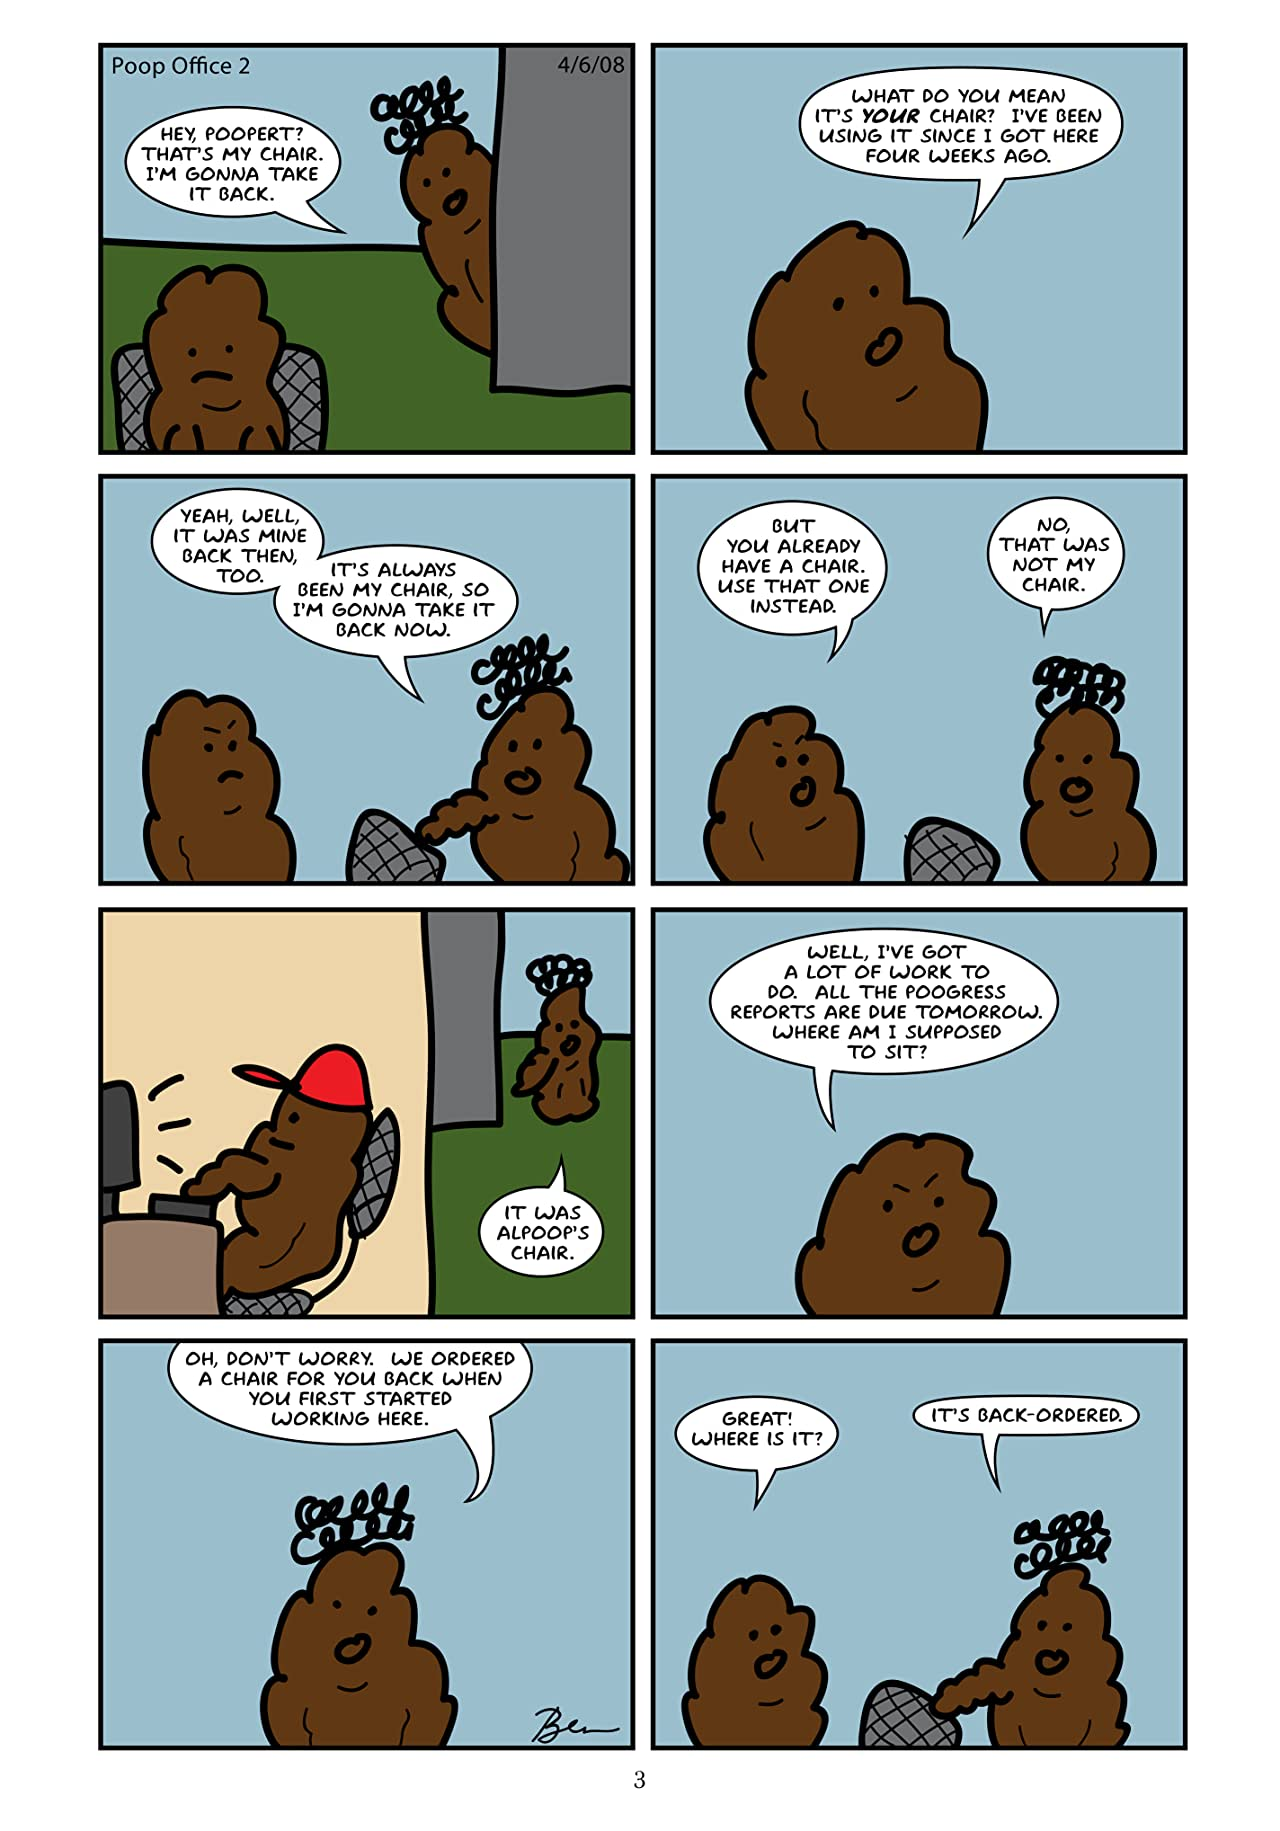 Poop Office Vol. 1: Tales from an Office Staffed by Poop